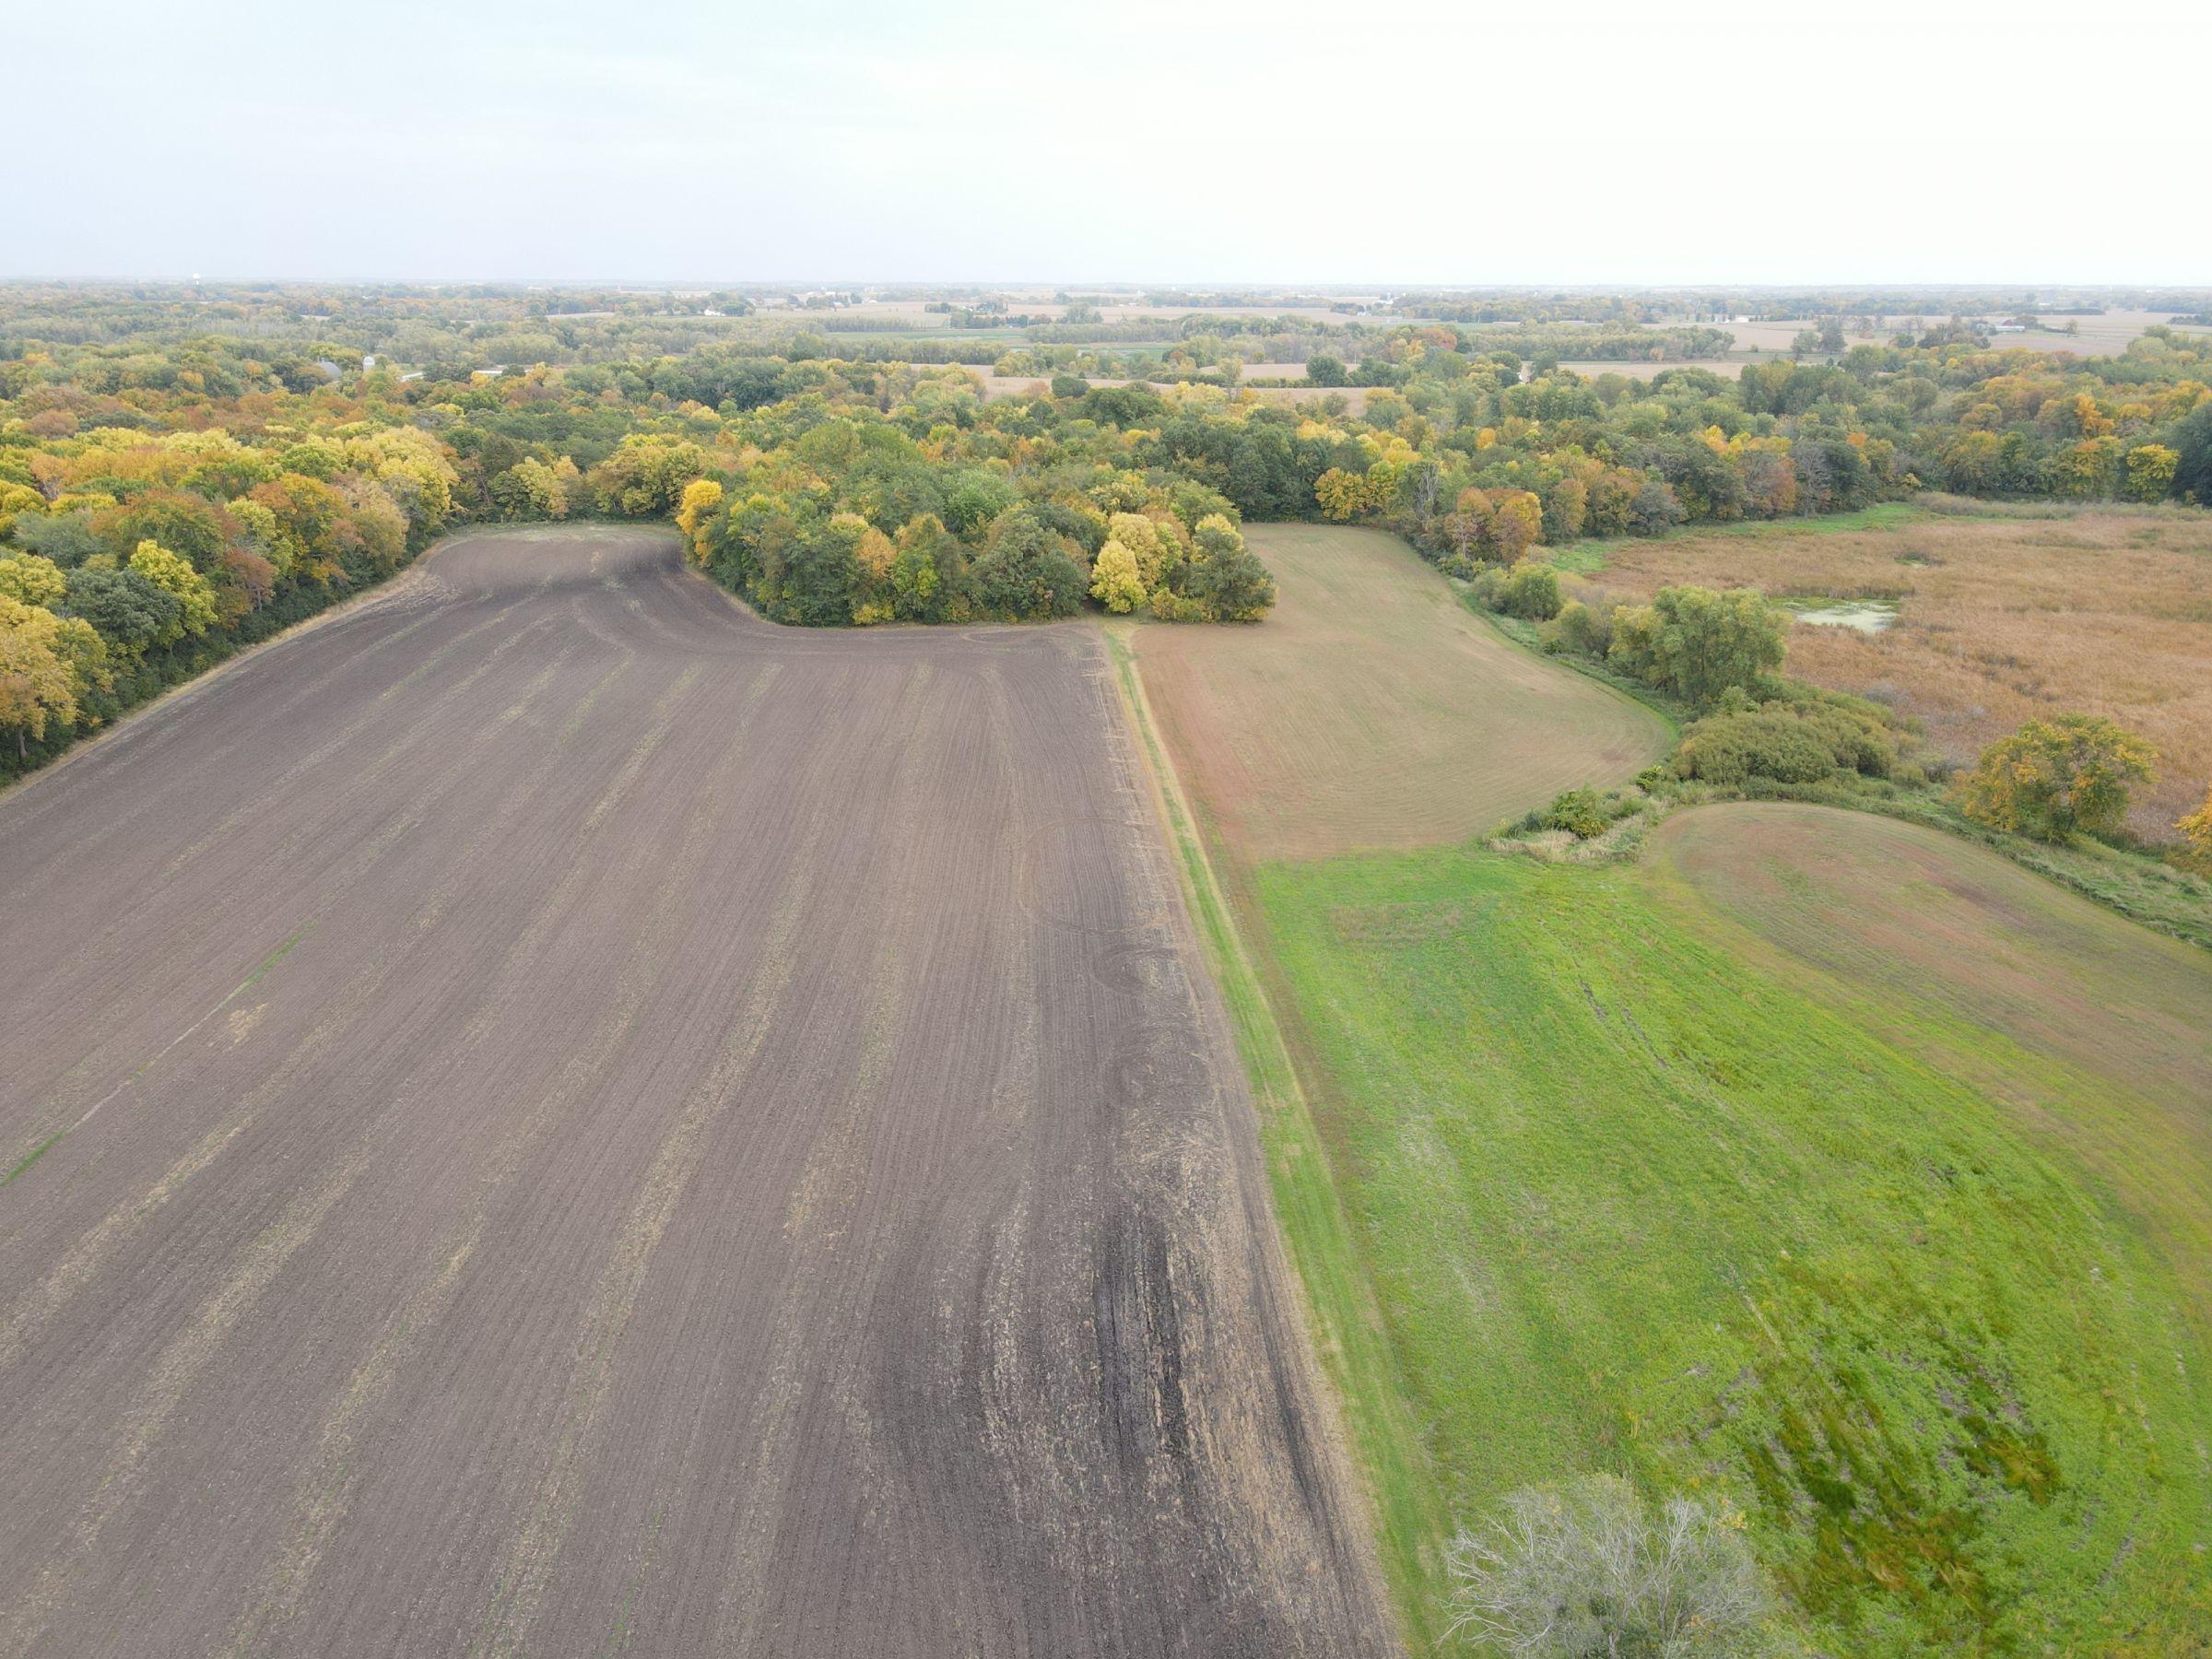 residential-land-mcleod-county-minnesota-80-acres-listing-number-15182-0-2020-10-07-142937.JPG